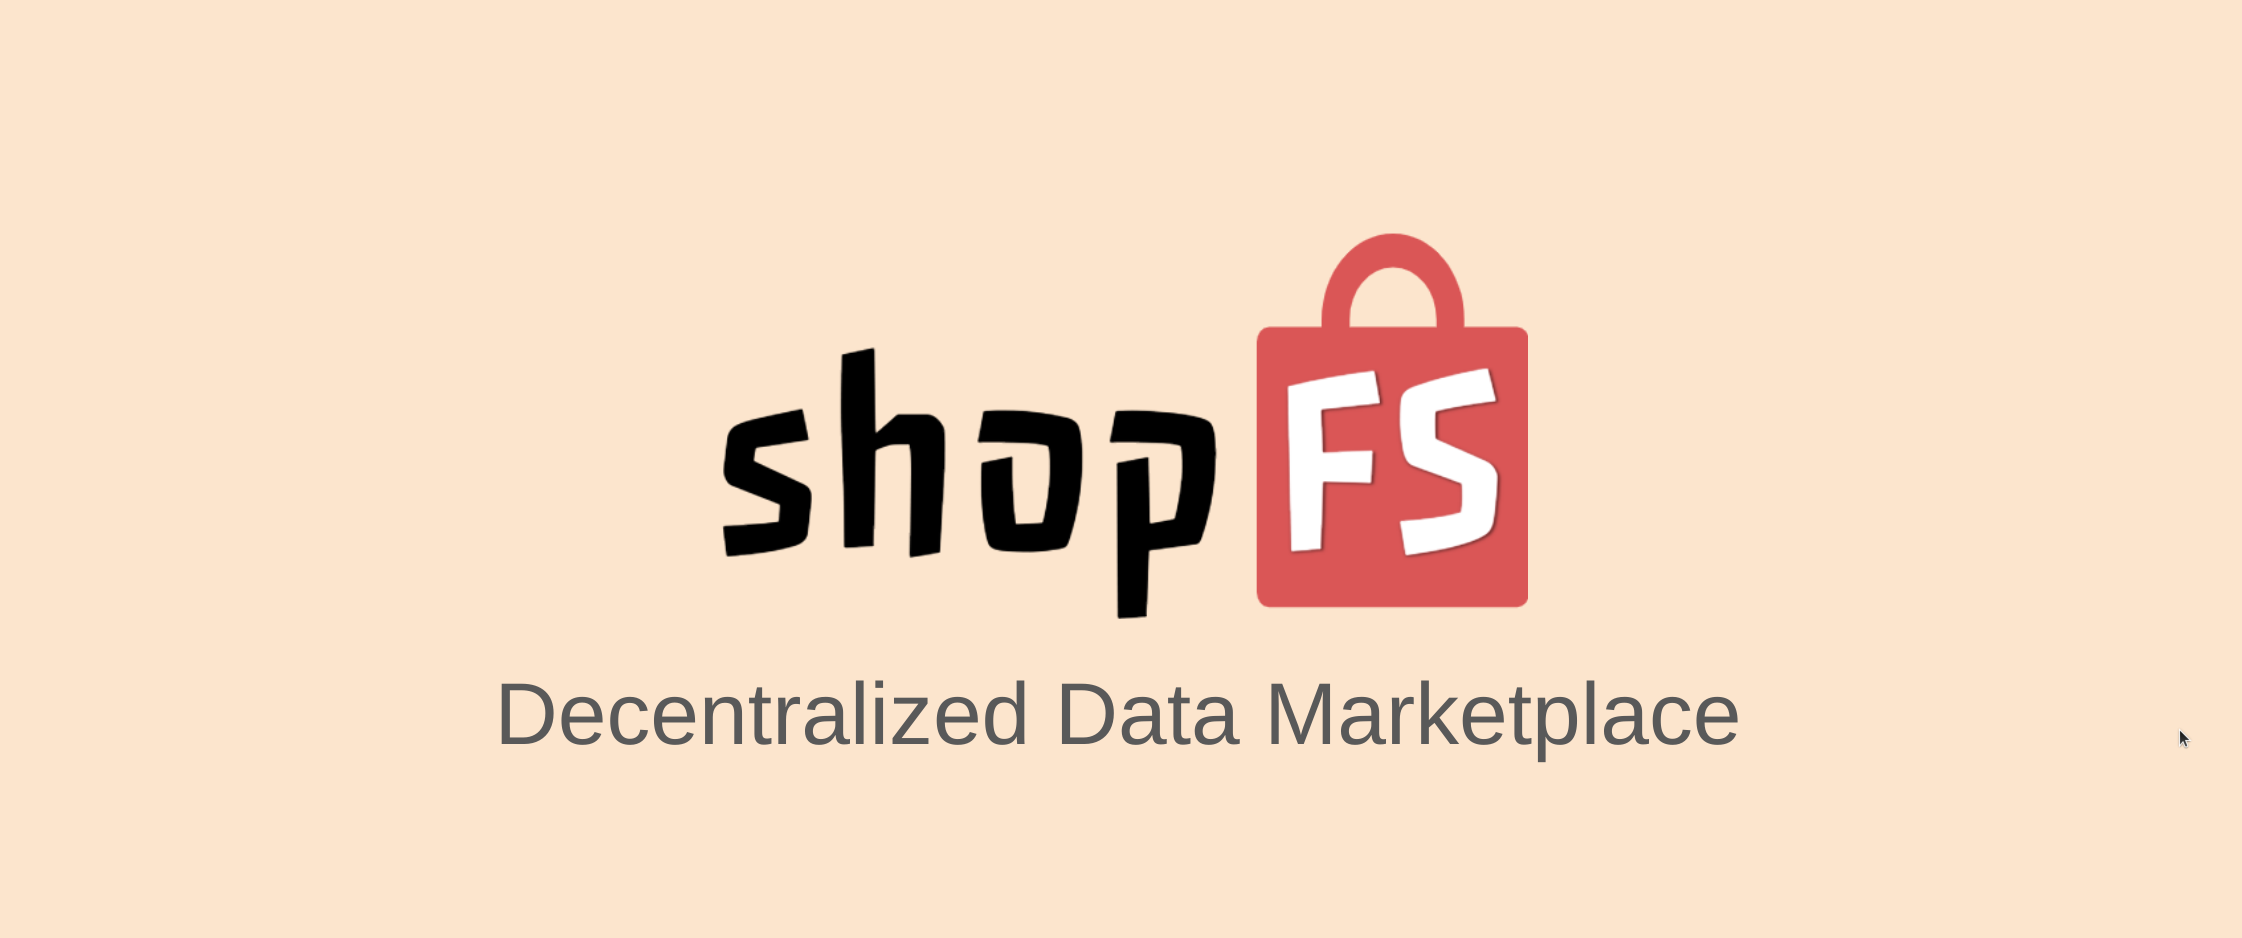 Shop FS showcase